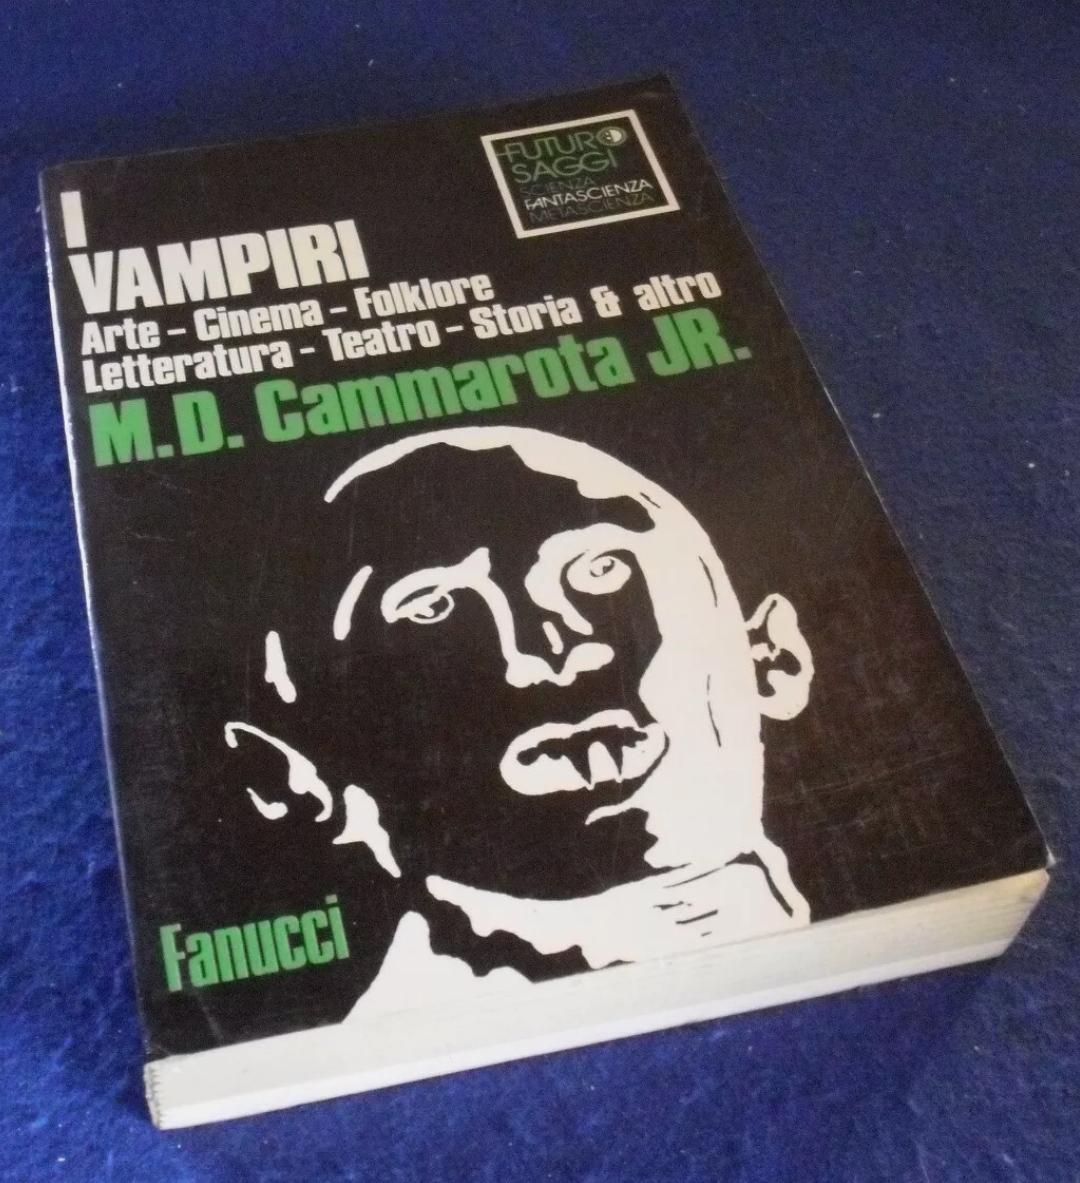 Cammarota Jr. I VAMPIRI Futuro Saggi Fantascienza Fanucci 1984 MOLTO RARO